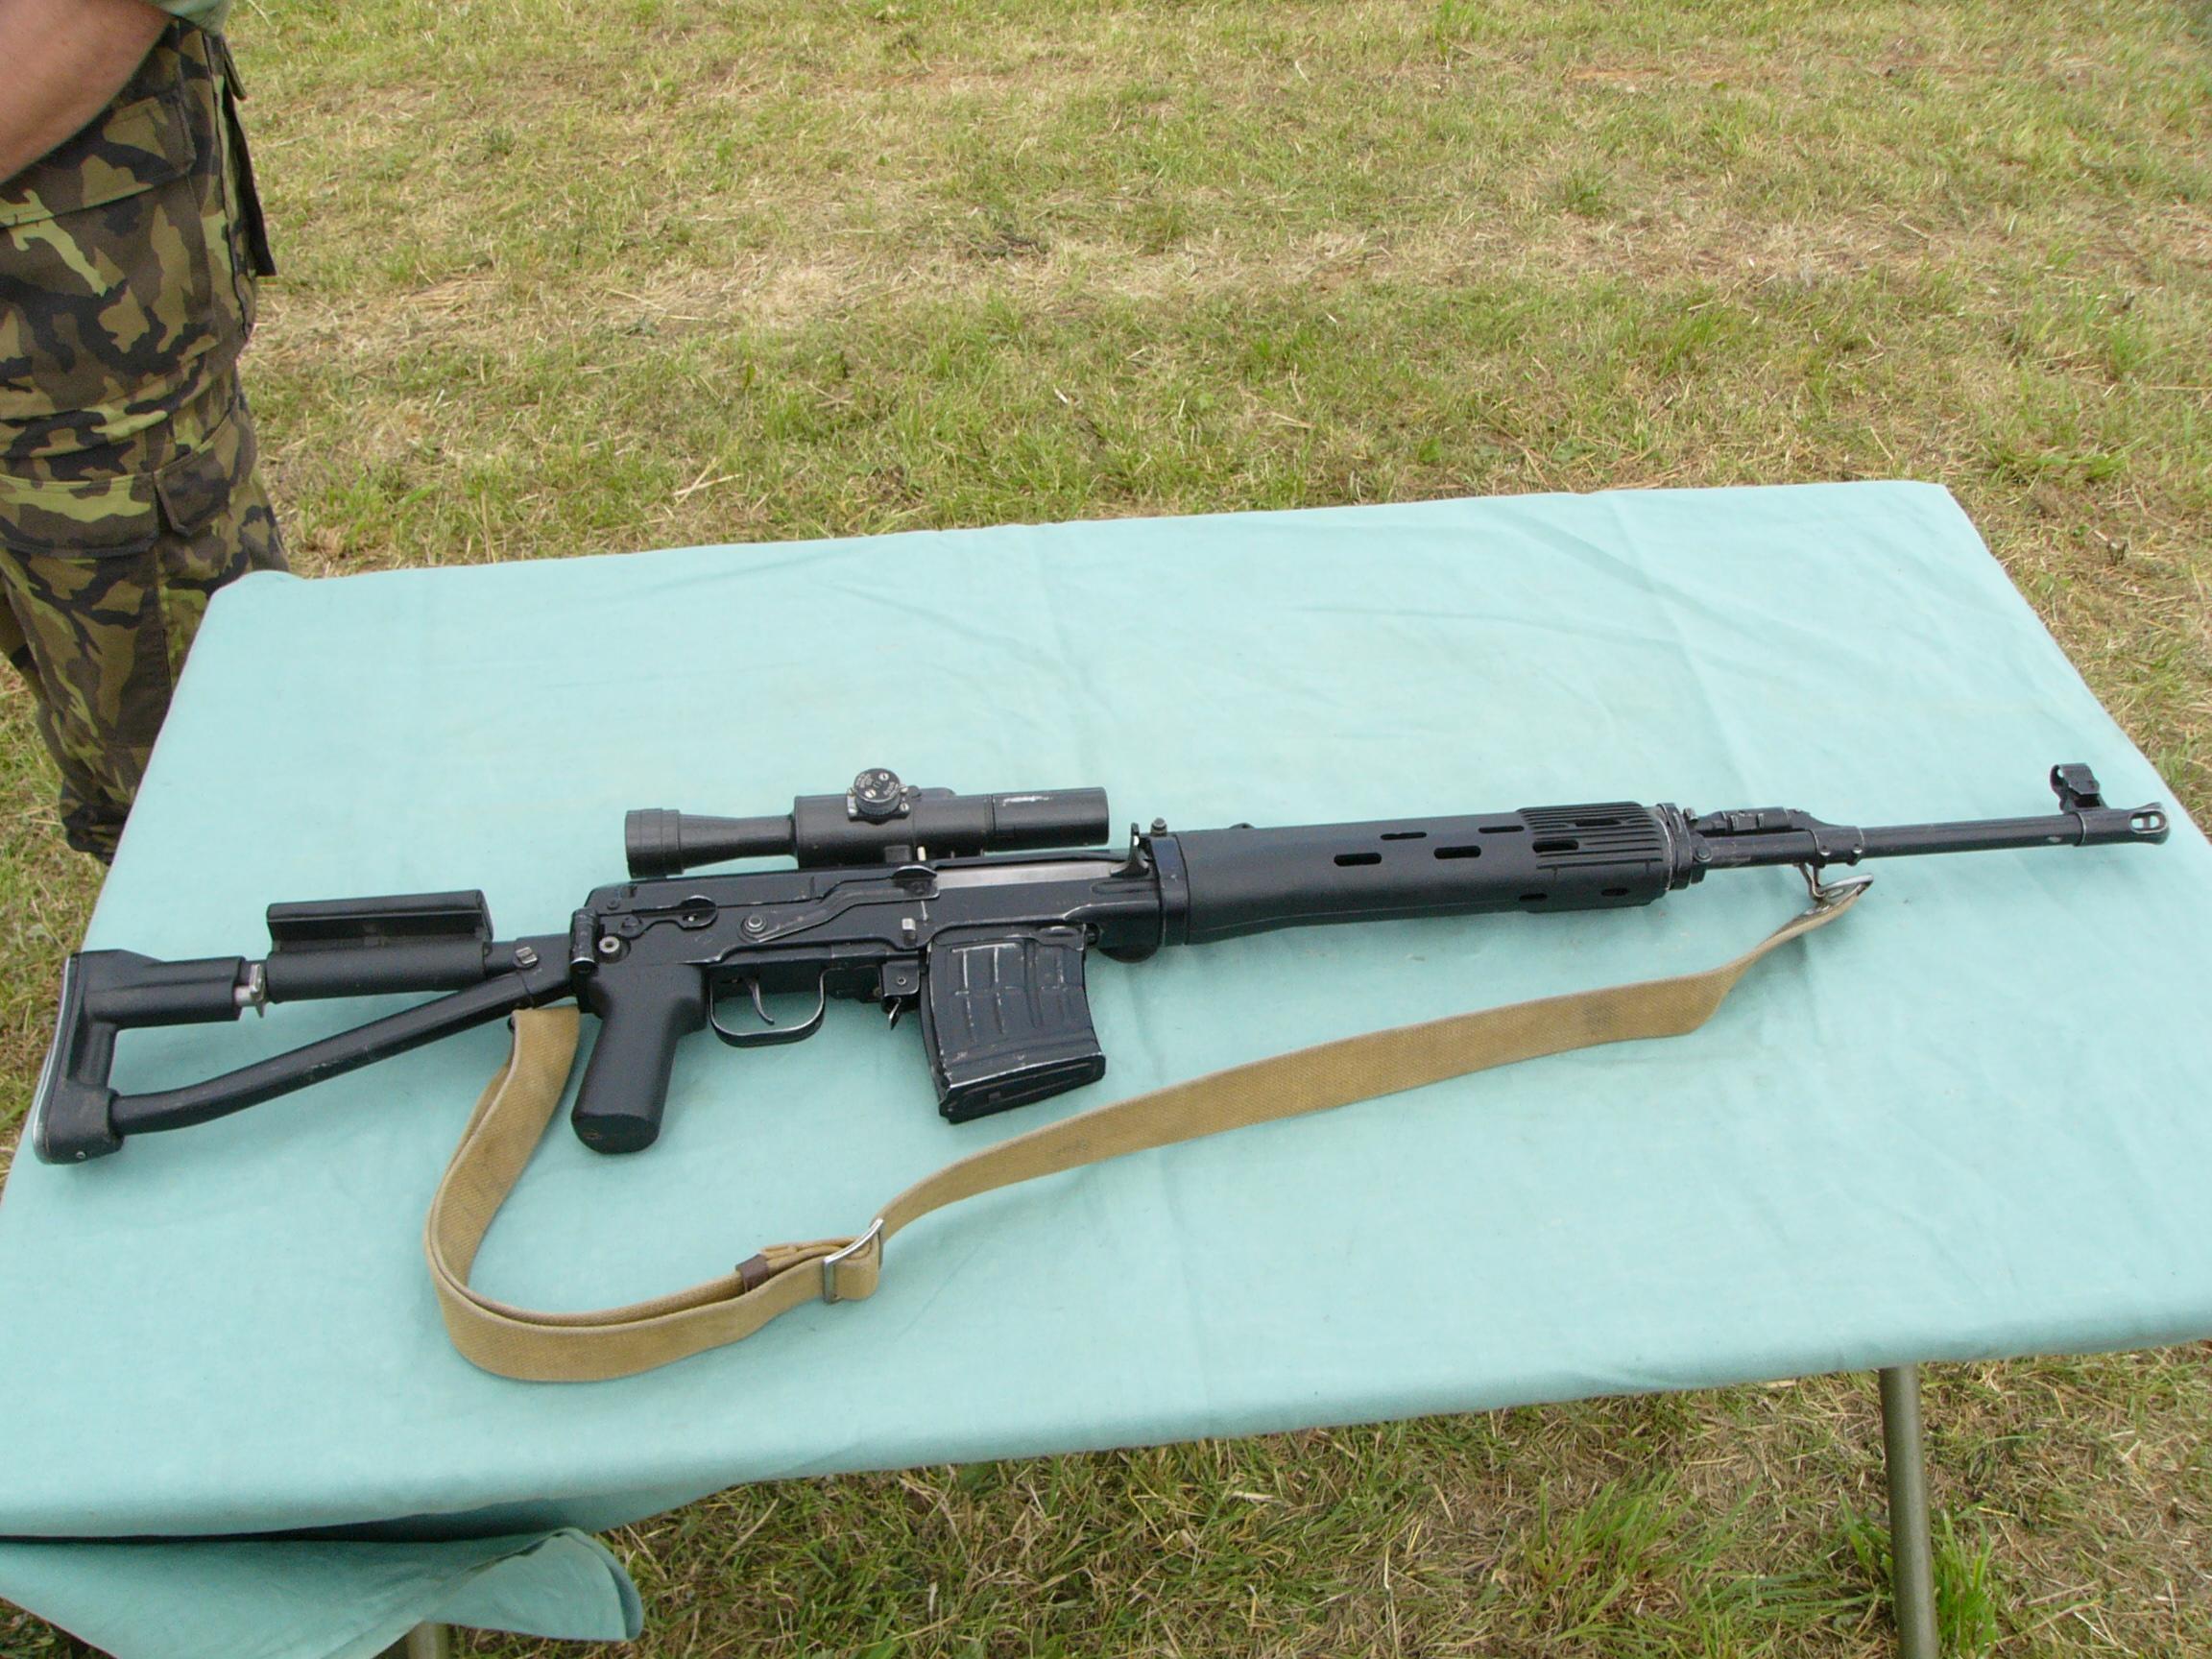 File:SVD rifle.jpg - Wikimedia Commons